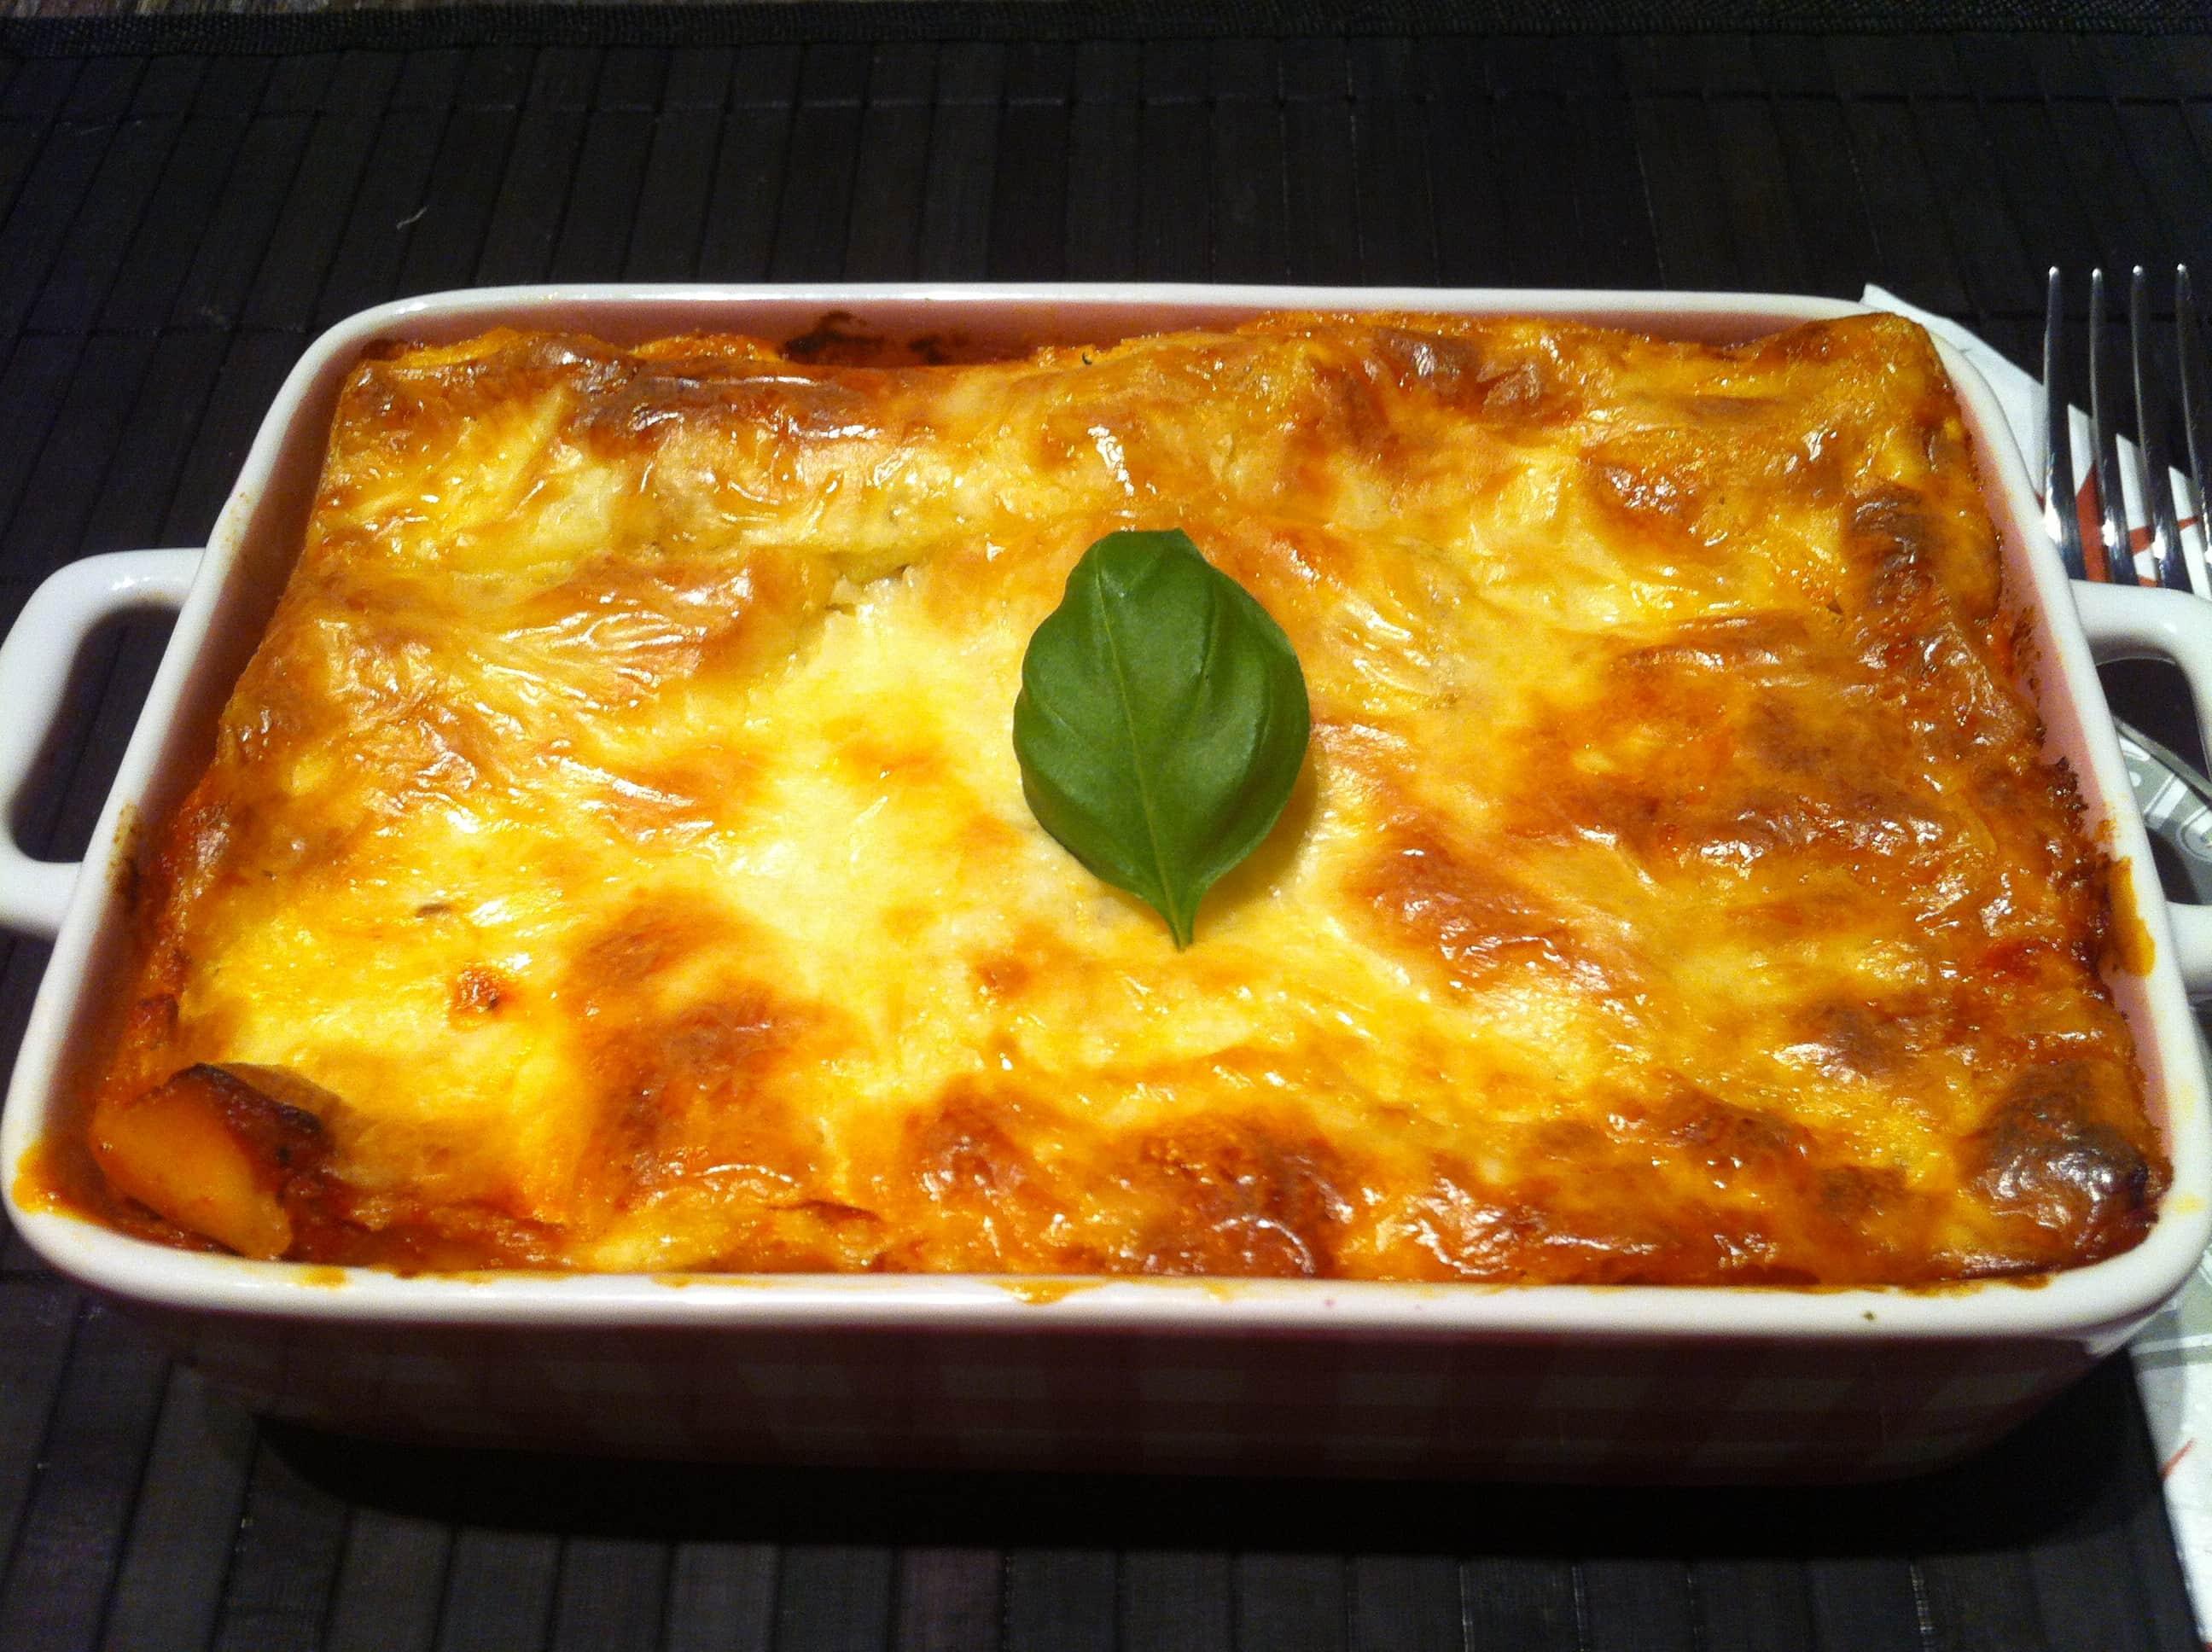 Die High Carb Lasagne an einer pikanten Bolognesesauce